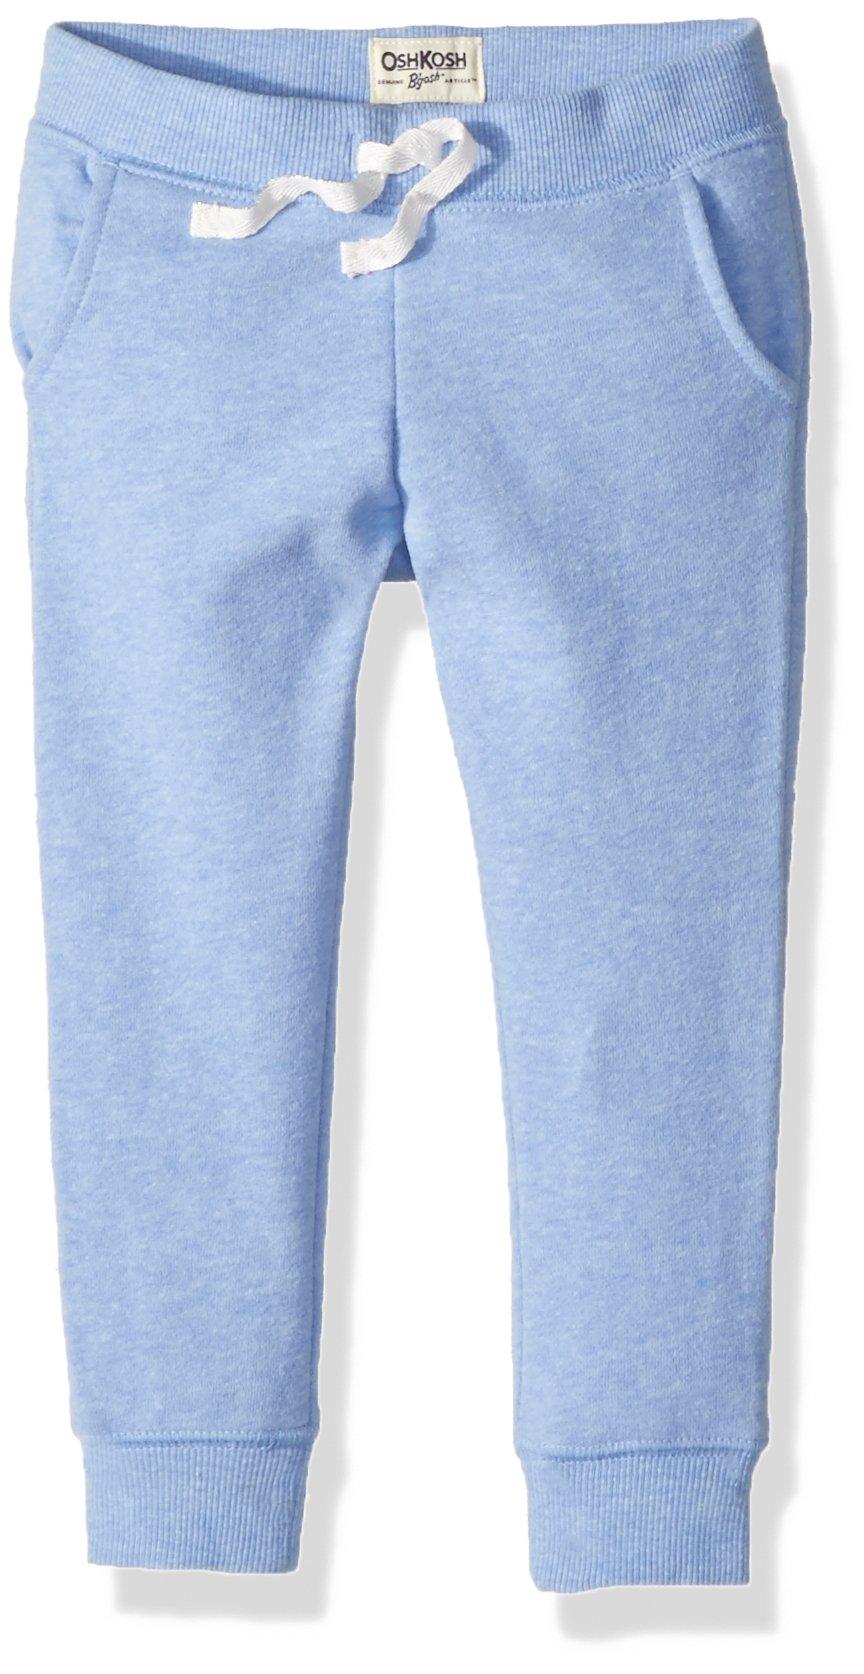 Osh Kosh Girls' Toddler Jogger Pants, Blue, 4T by OshKosh B'Gosh (Image #1)